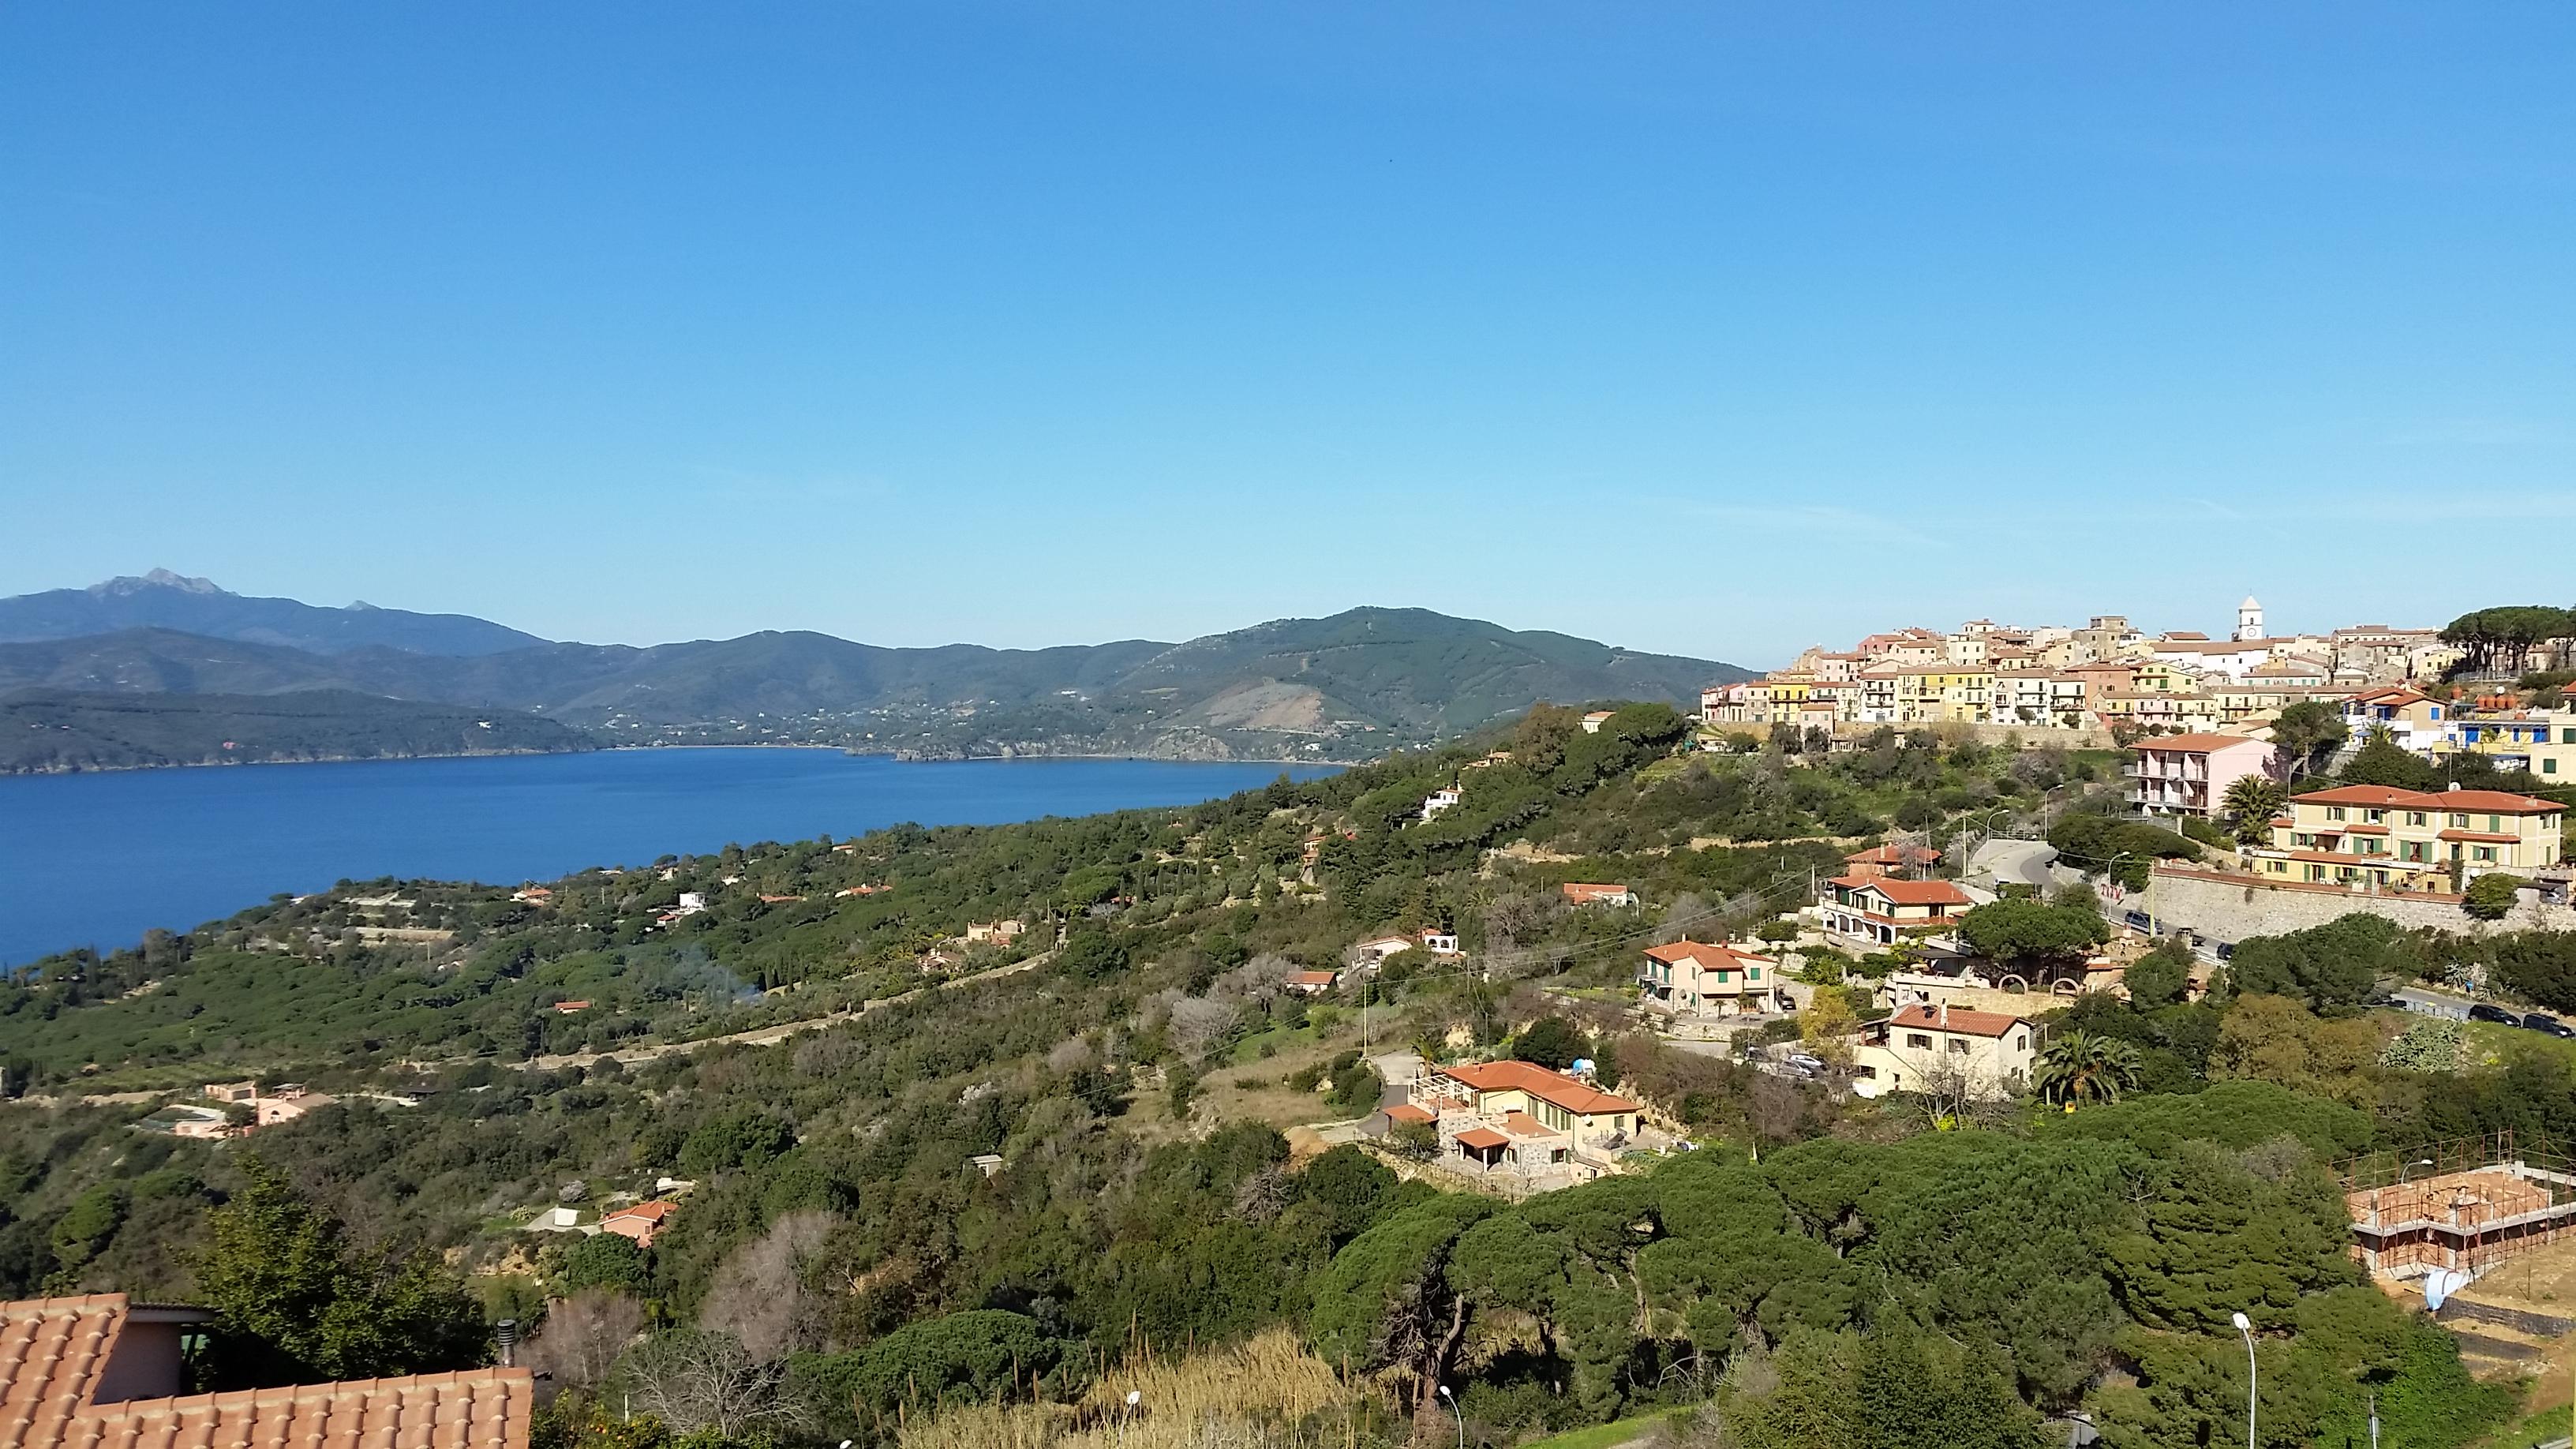 Capoliveri (LI) - Isola d'Elba